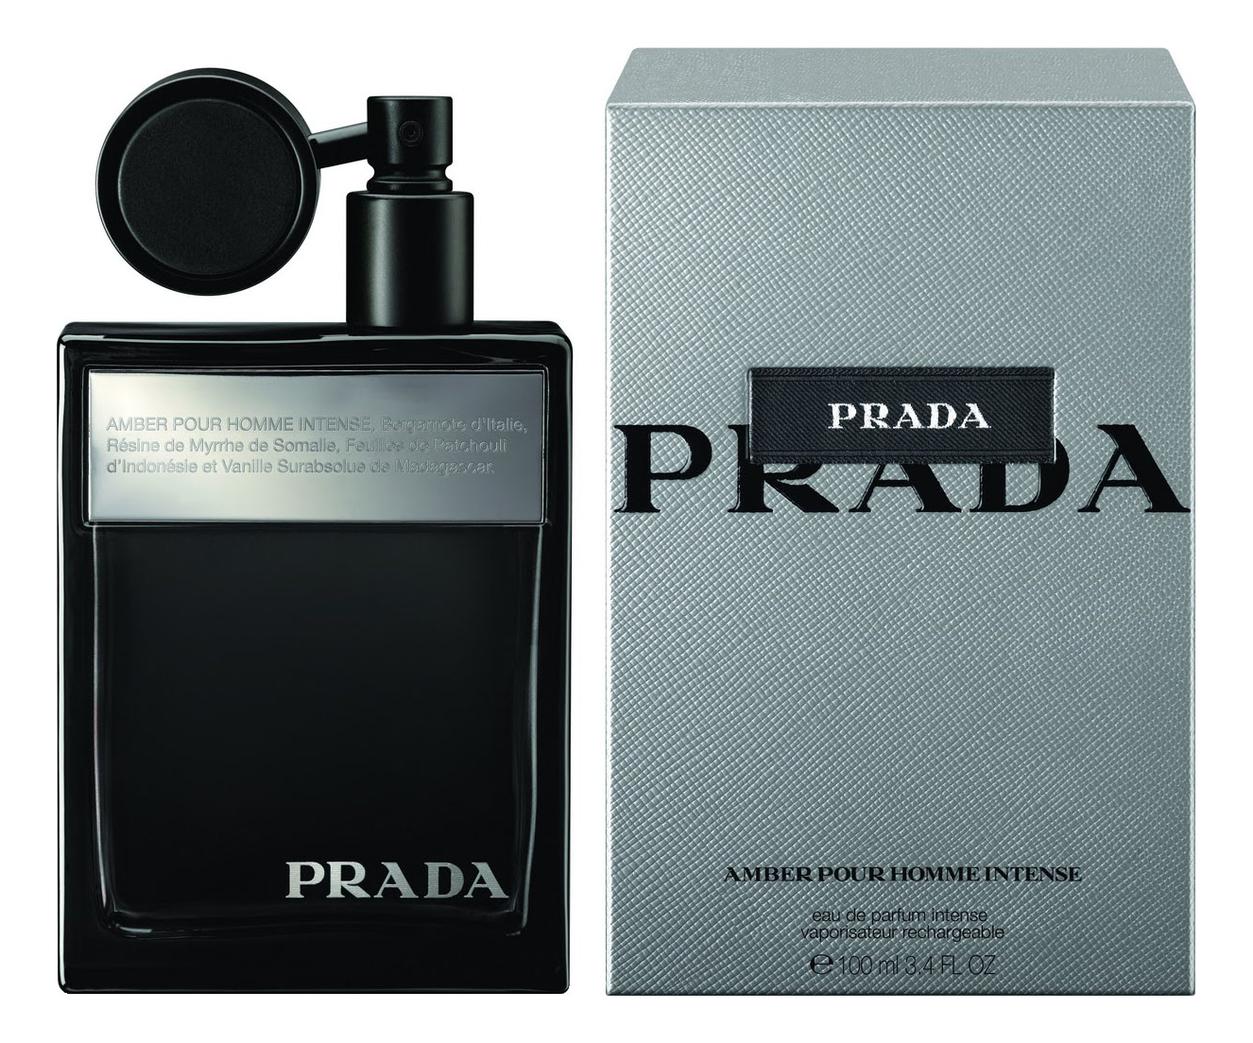 Prada Amber Pour Homme Intense: парфюмерная вода 100мл